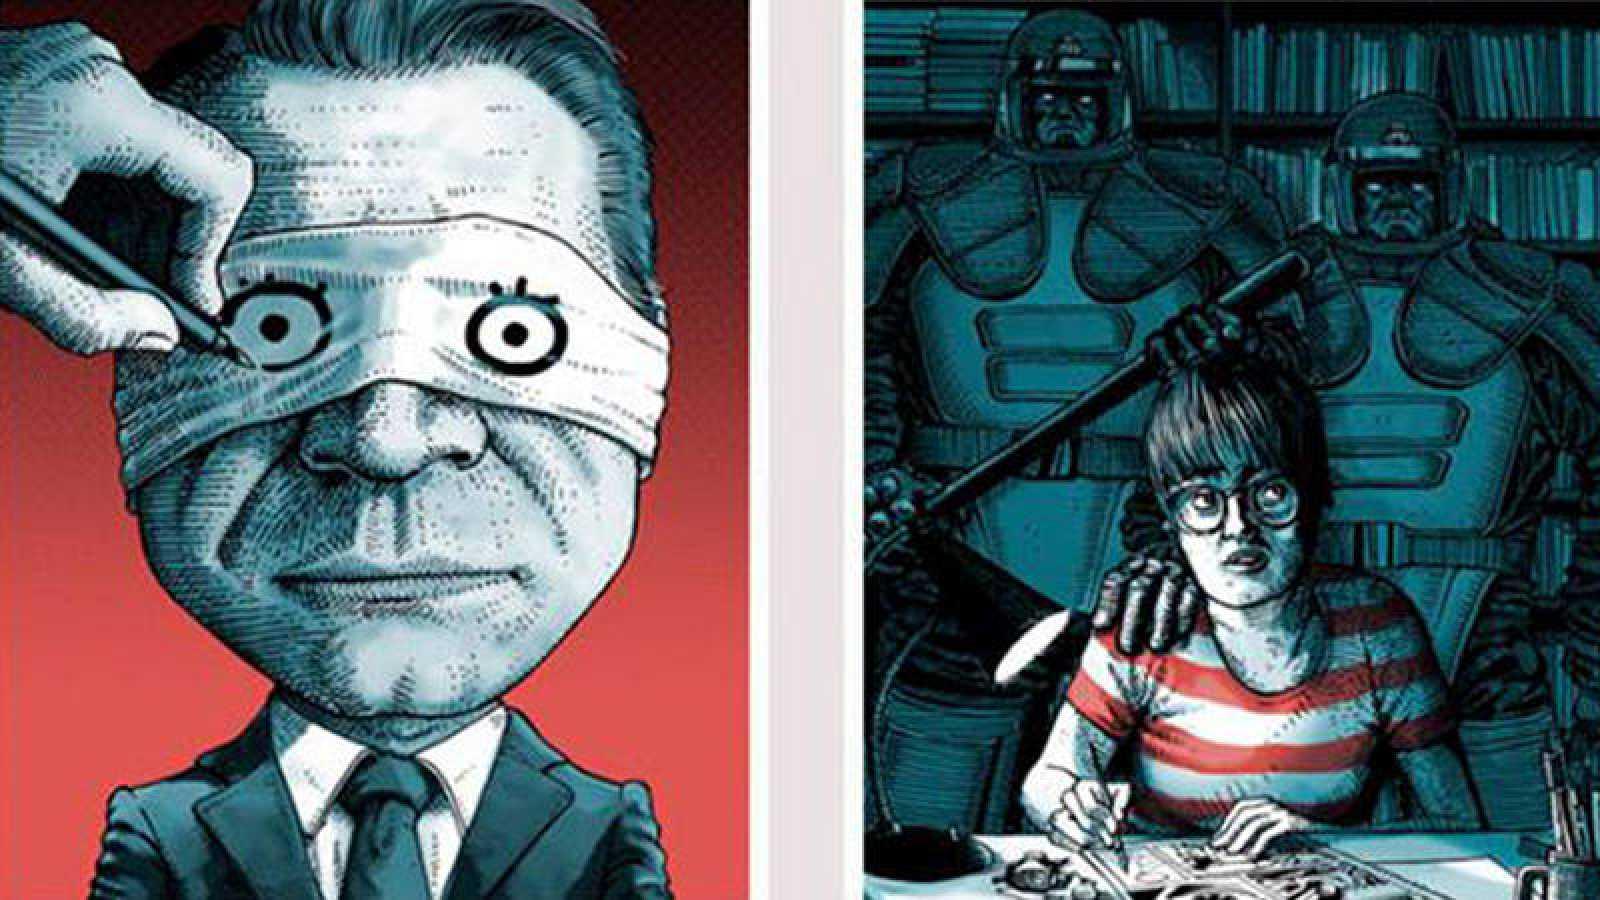 Ilustraciones de Ata para los carteles del Festival Internacional CòmicNostrum 2017